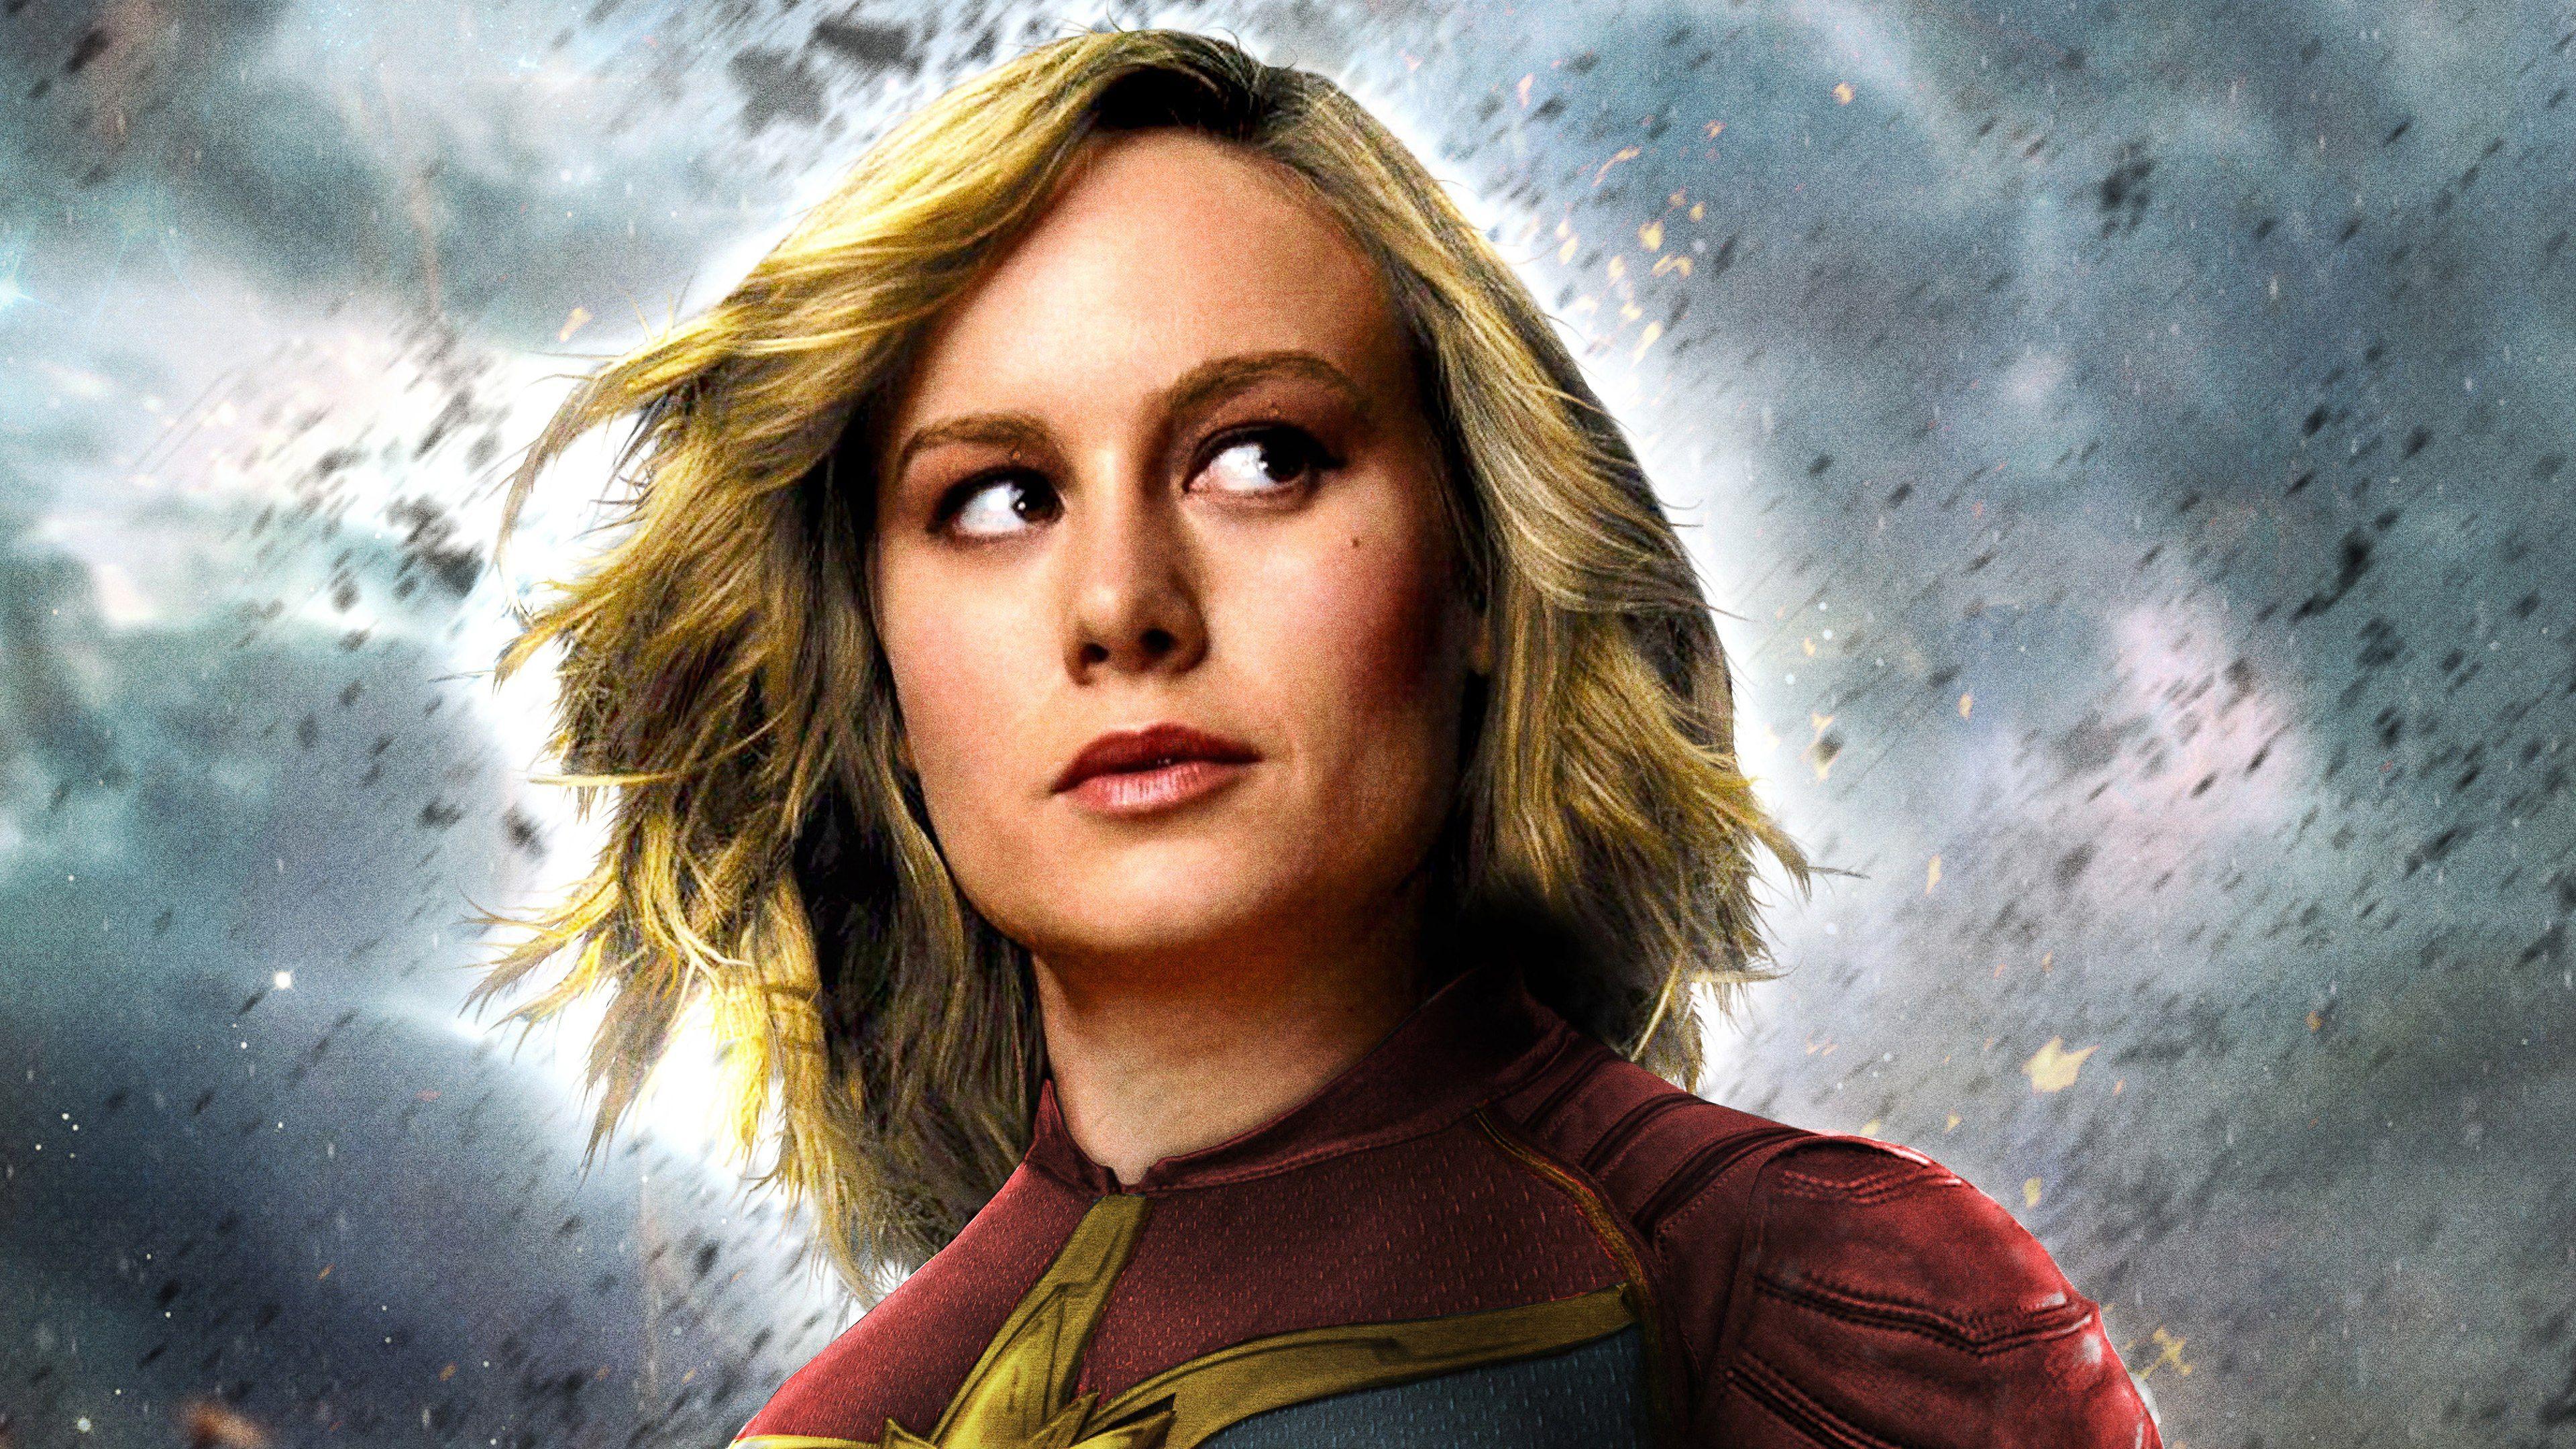 Captain Marvel Movie 2019 Brie Larson as Carol Danvers 4K 3840x2160